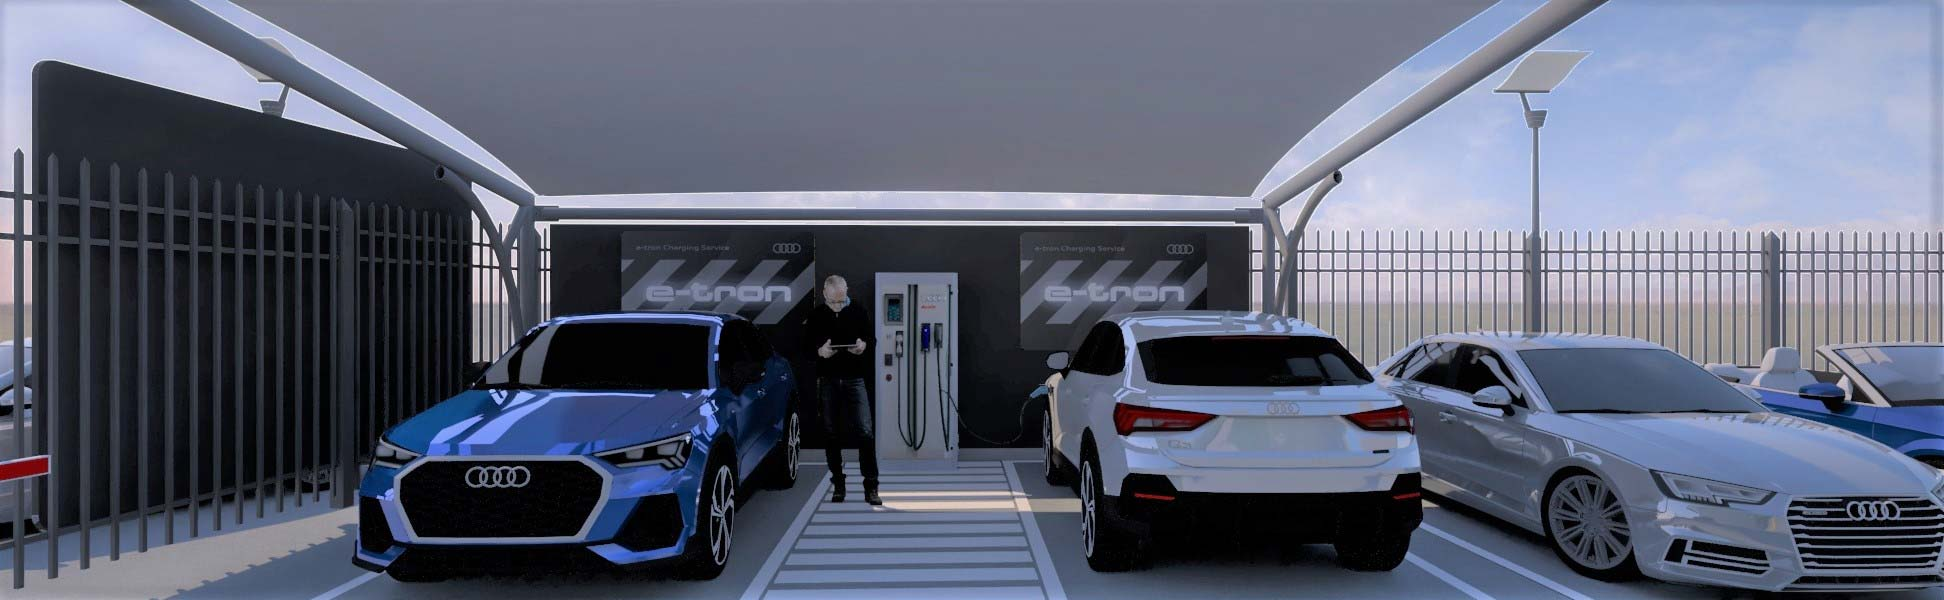 Red de carga eléctrica Audi Argentina